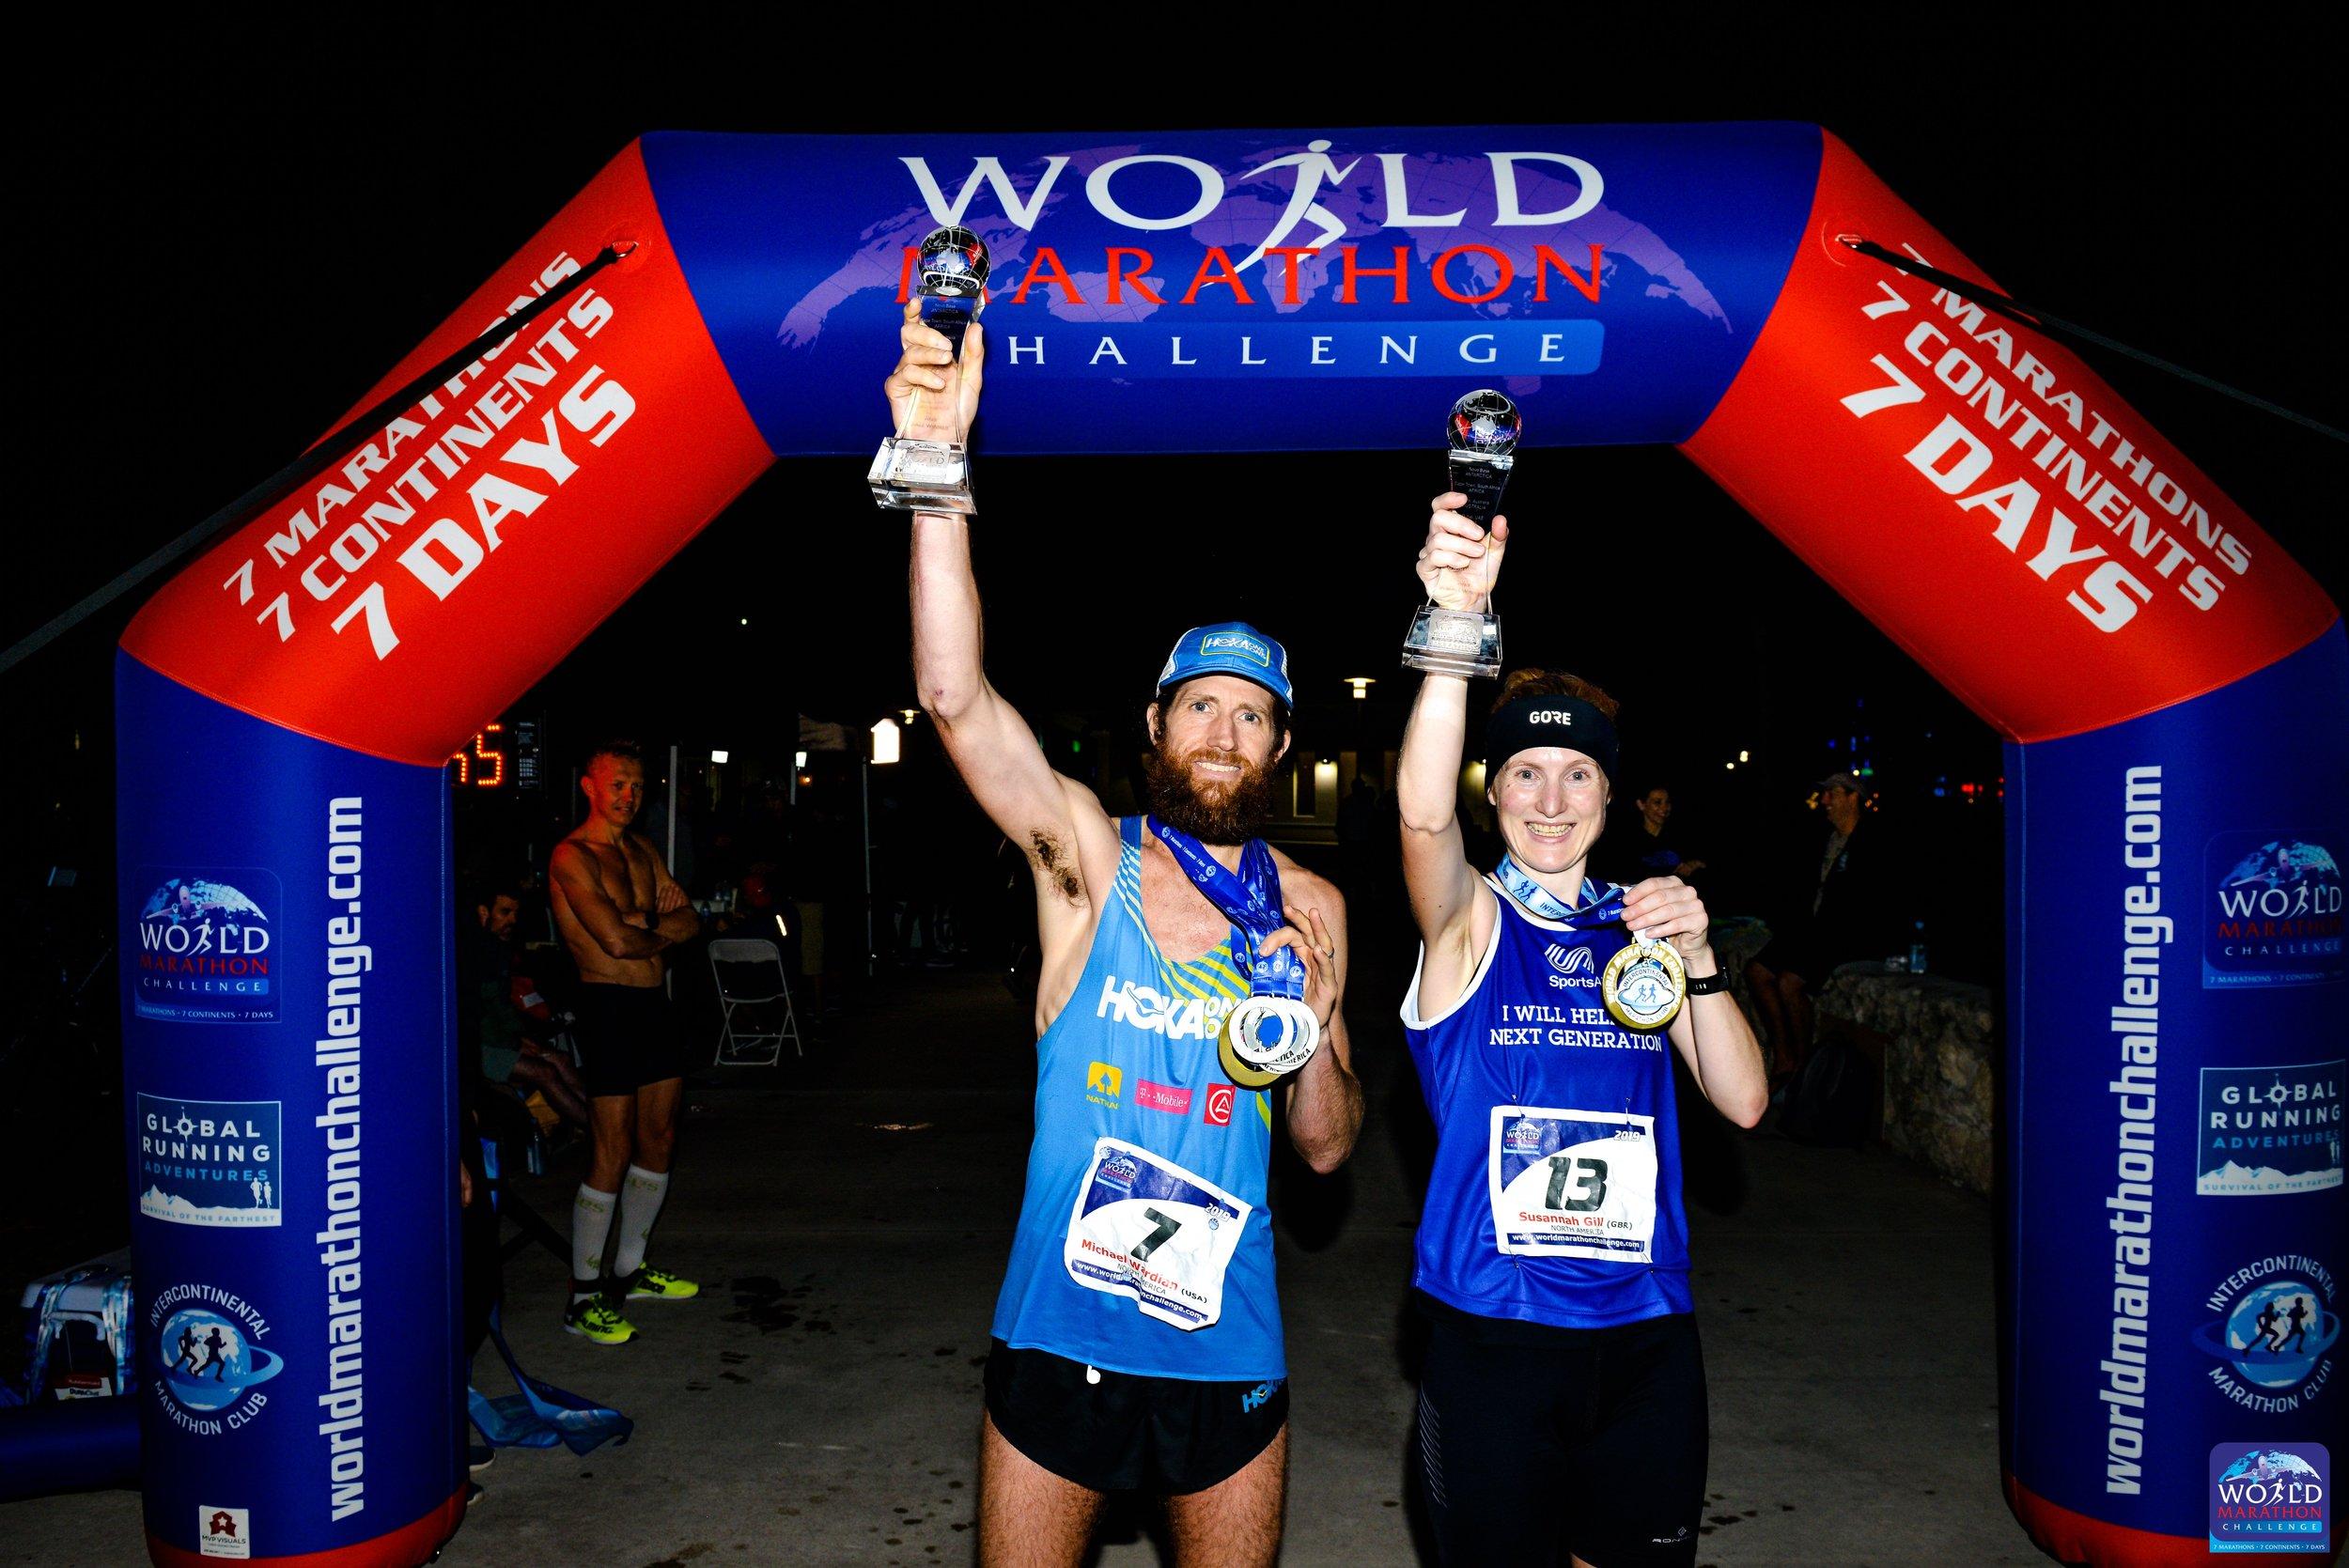 Susannah Gill with Mike Wardian in Miami_2019 World Marathon Challenger winners 2 .jpg